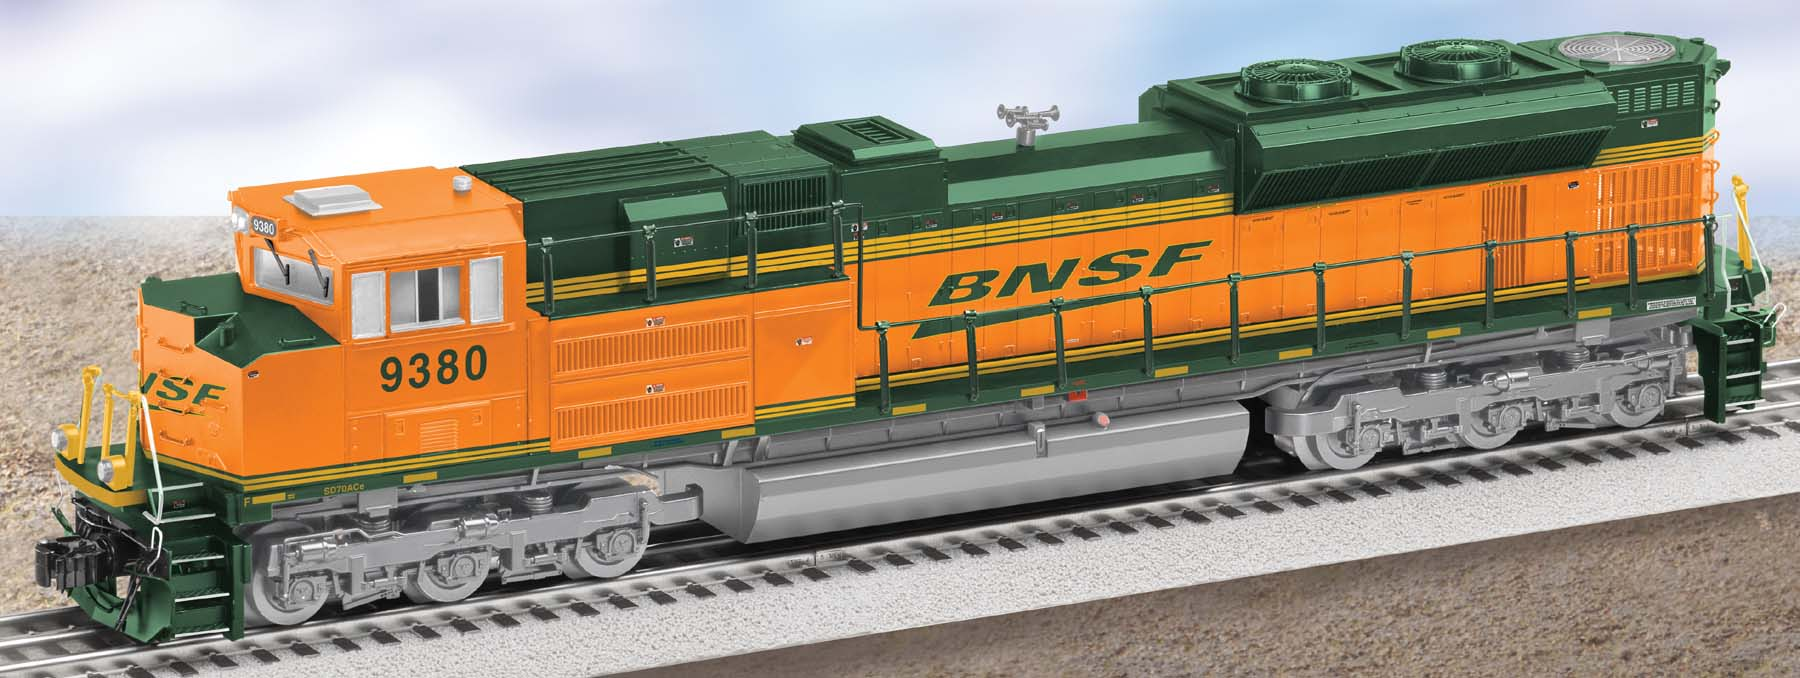 Lionel BNSF | eBay